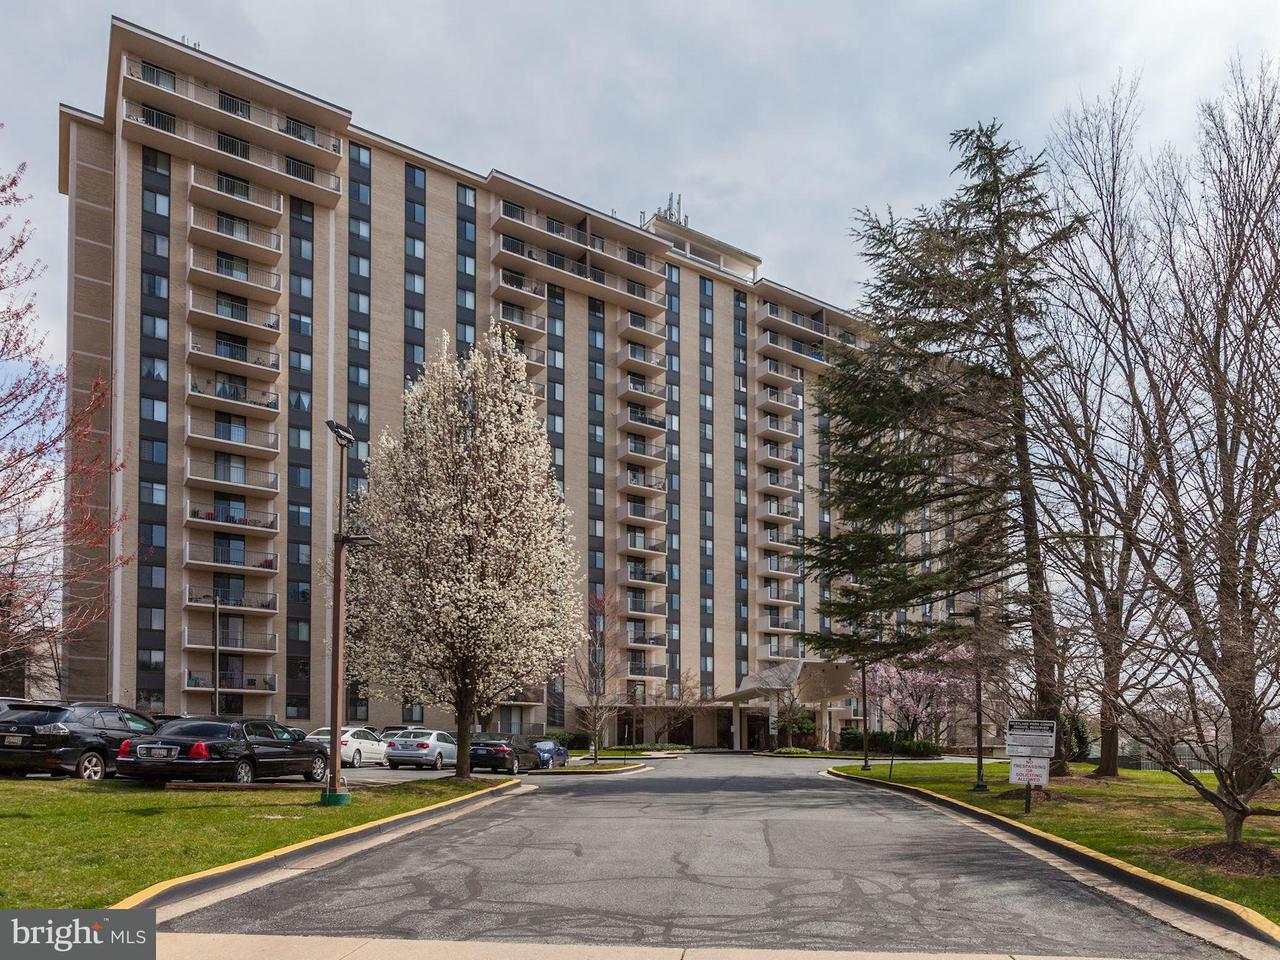 Single Family for Sale at 7420 Westlake Ter #1602 Bethesda, Maryland 20817 United States